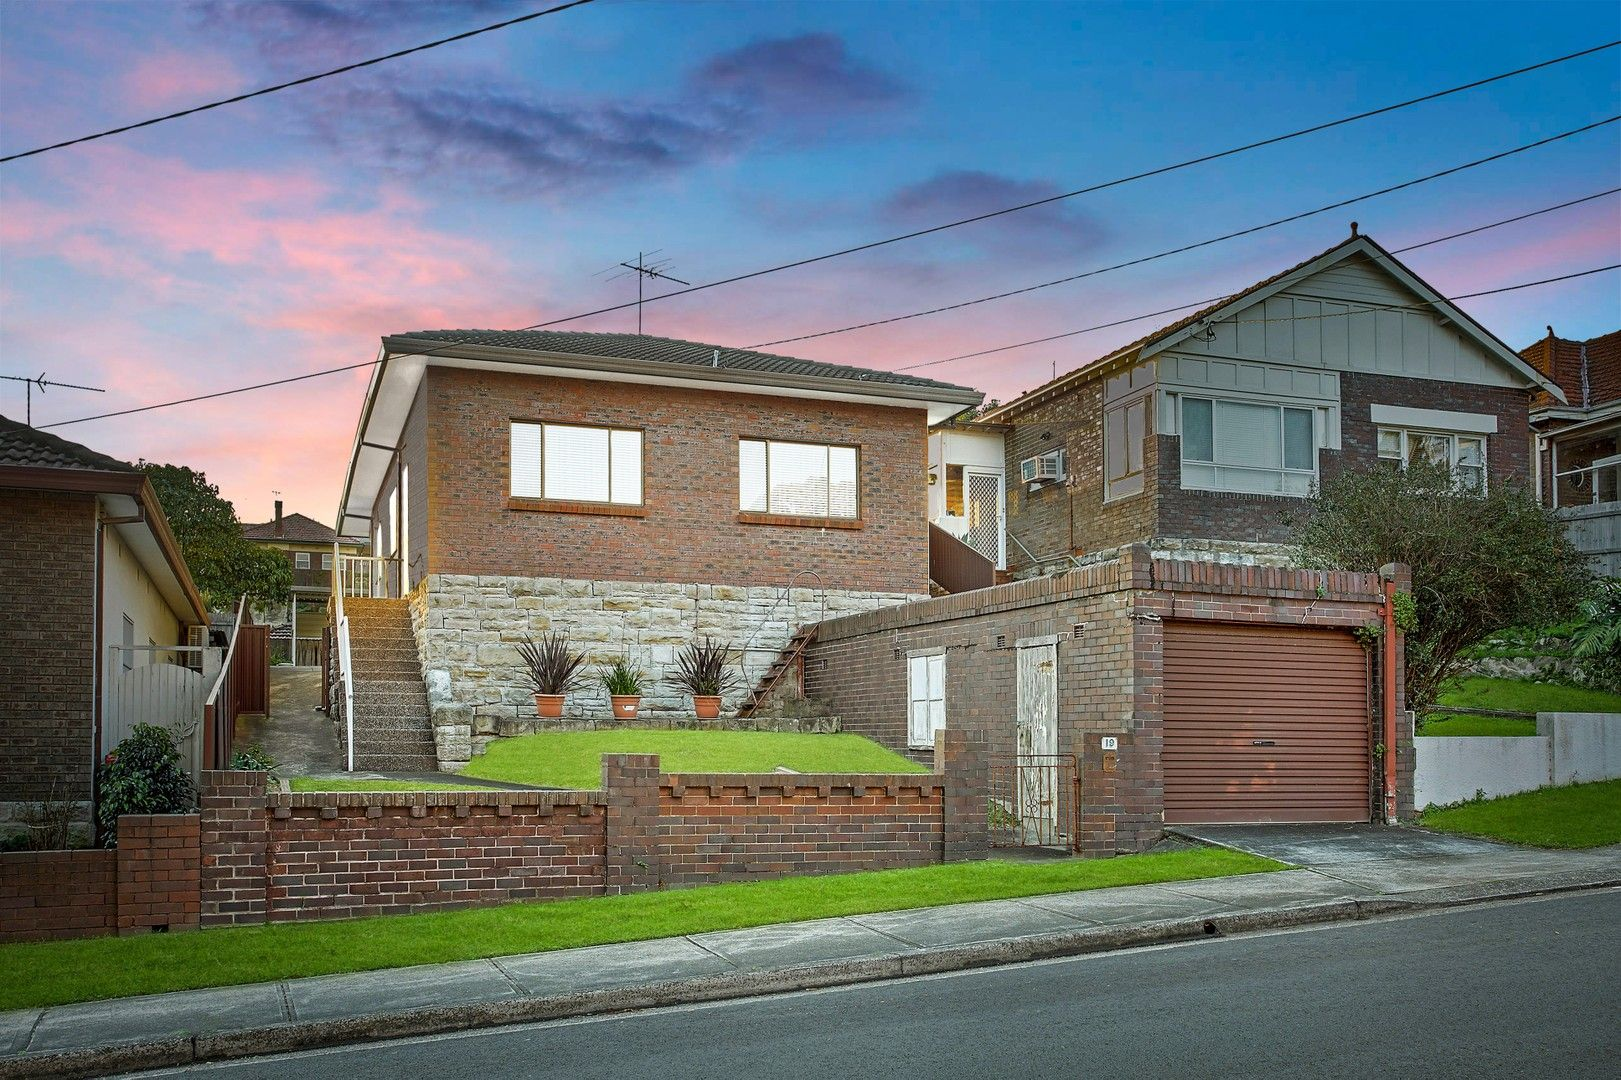 3 bedrooms House in 19 Arlington Street ROCKDALE NSW, 2216